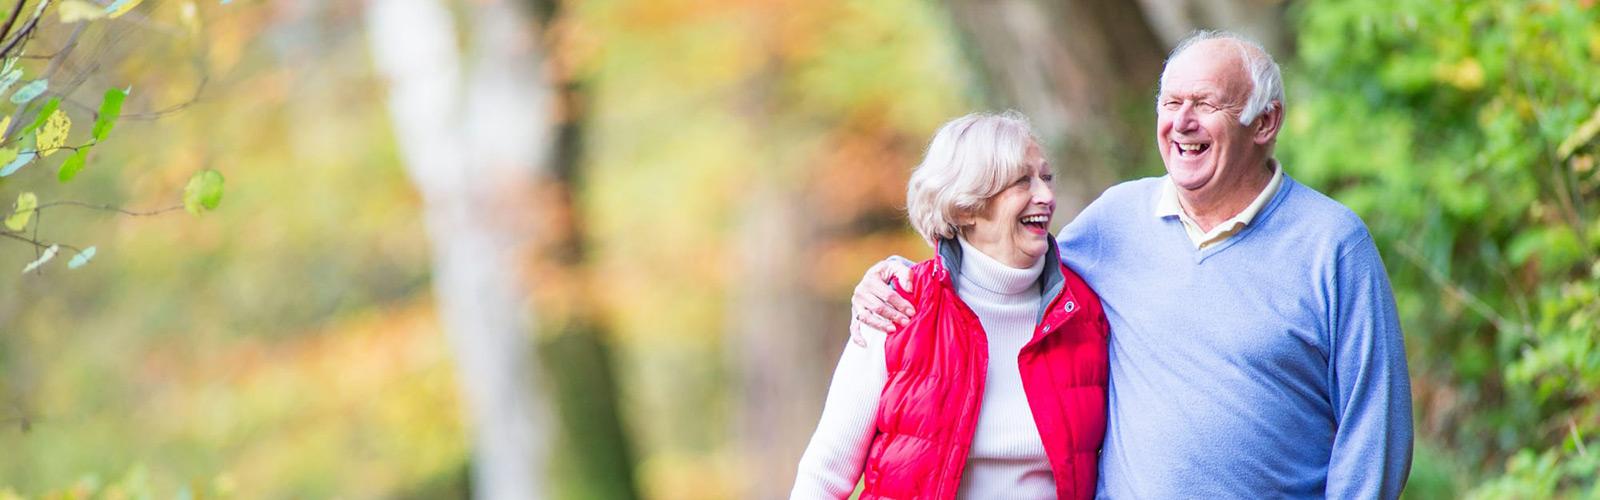 Where To Meet Swedish Seniors In Fl Free